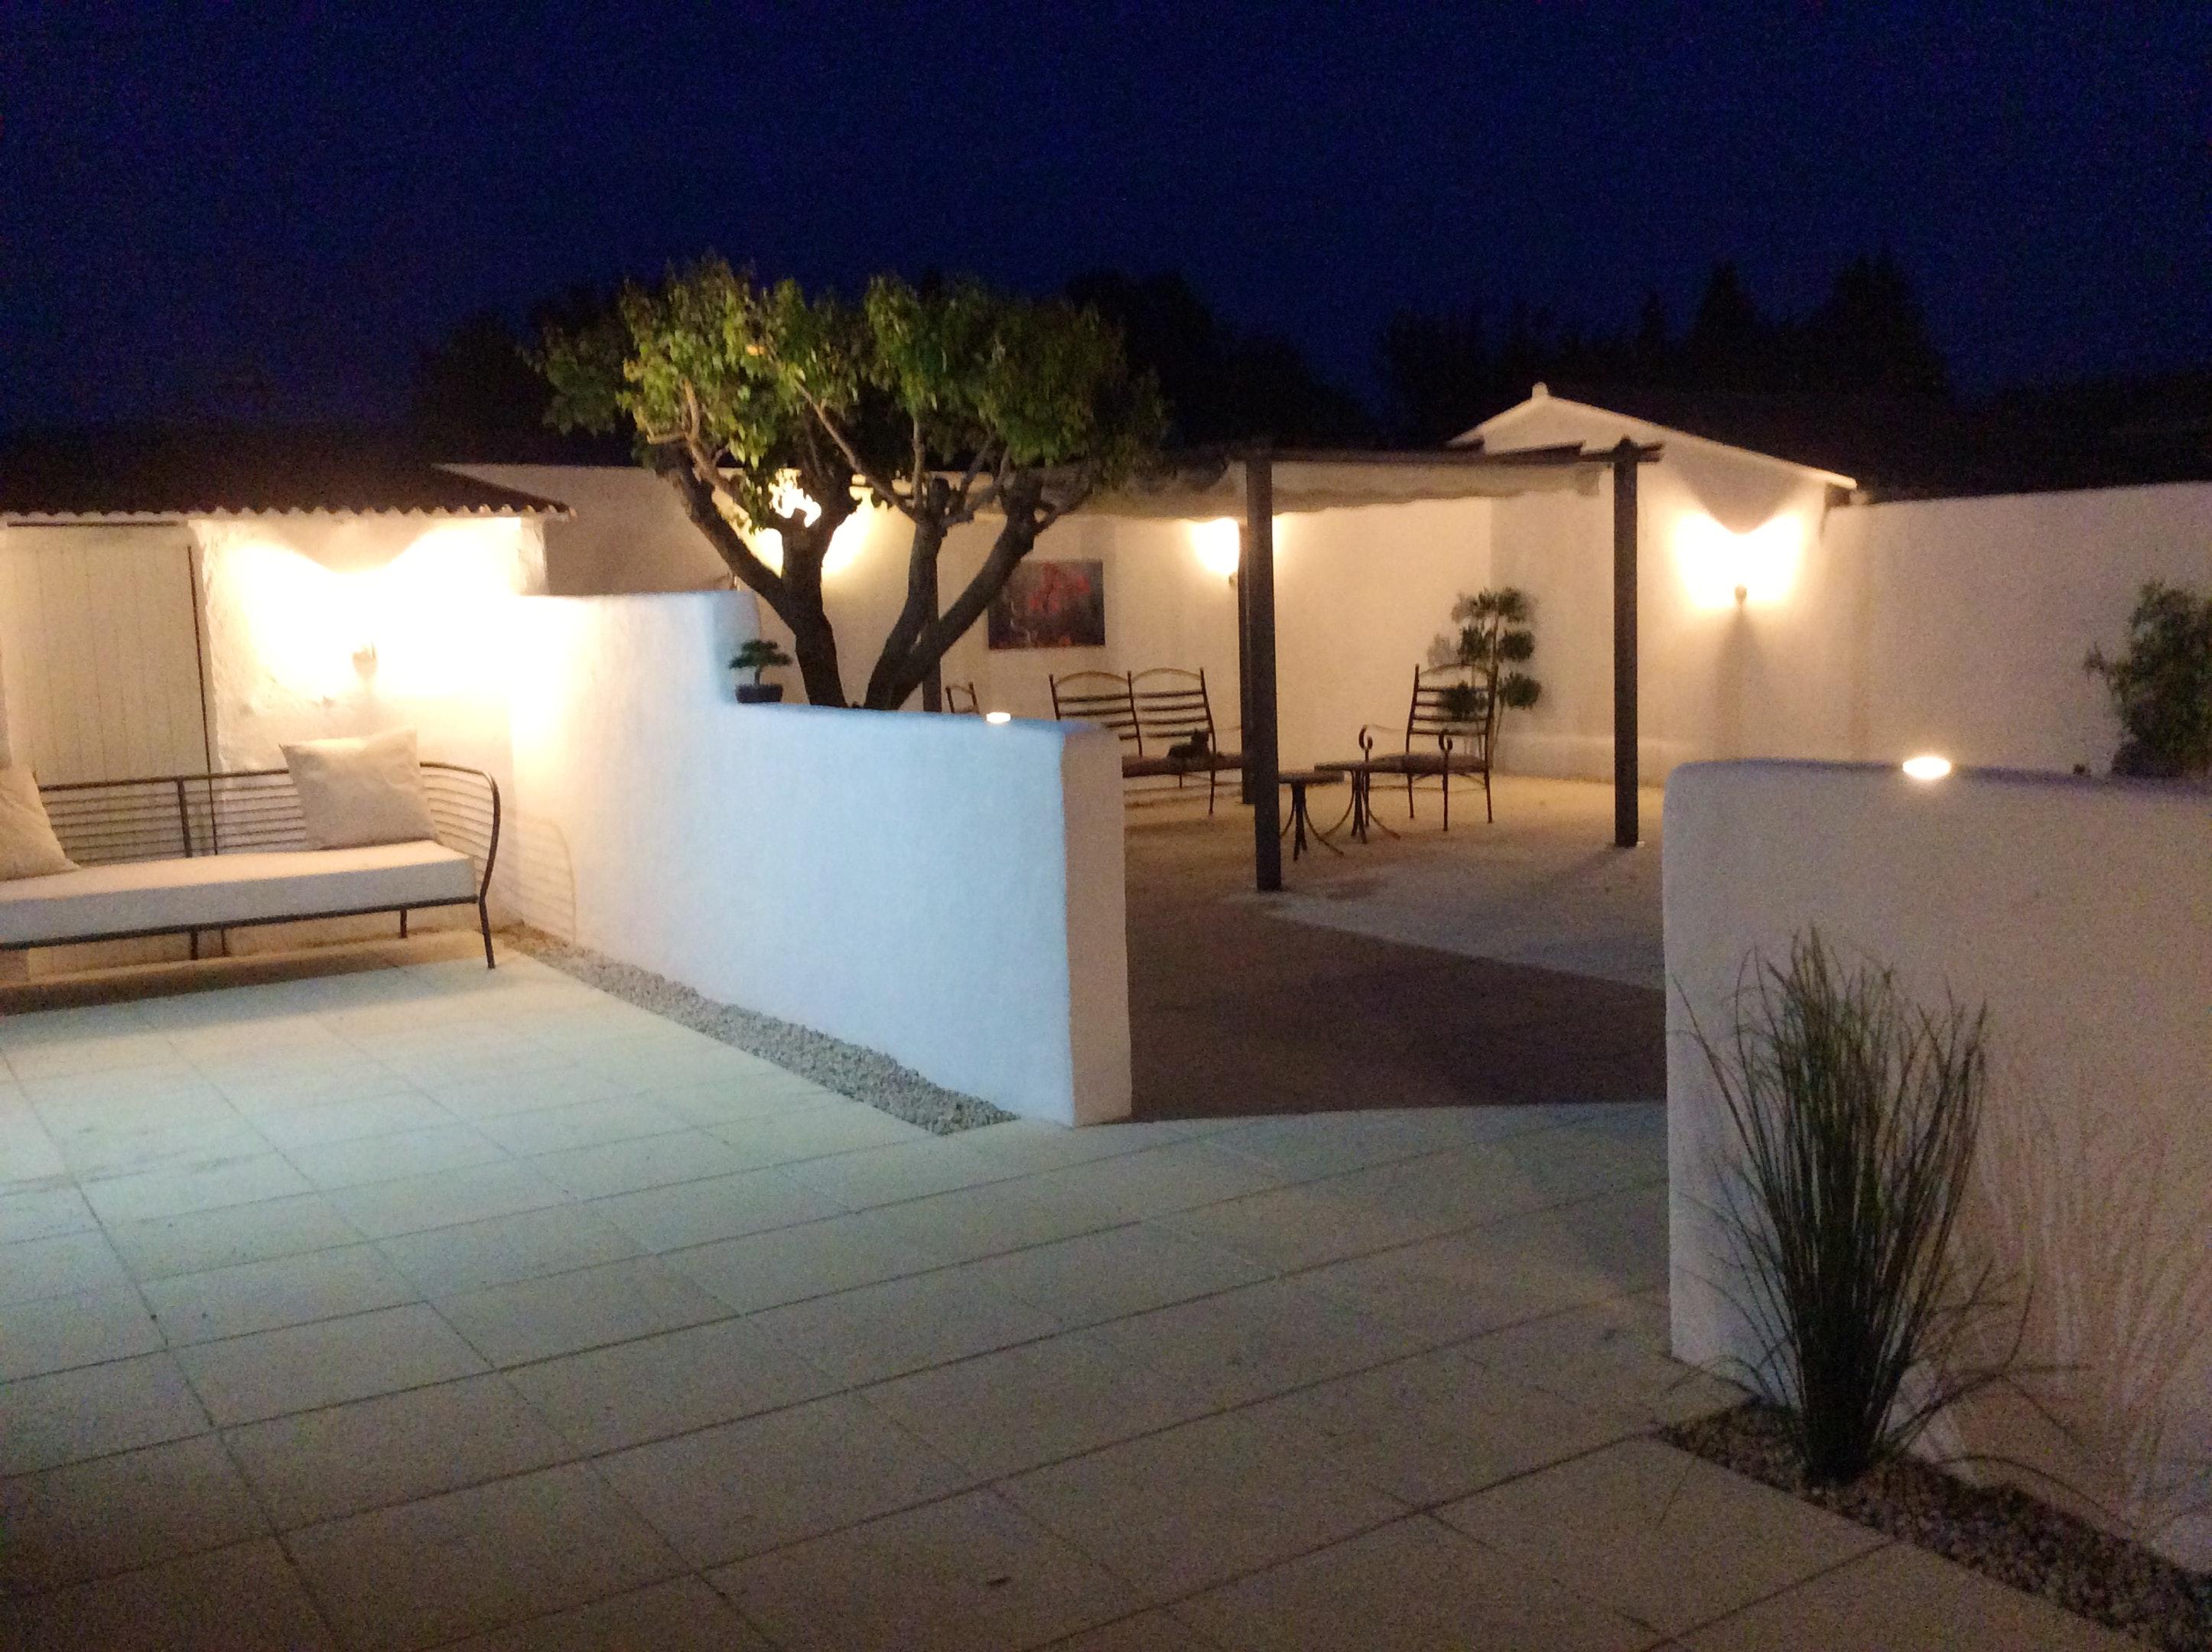 Holiday house Villa mit 3 Schlafzimmern in L'Isle-sur-la-Sorgue mit privatem Pool, möblierter Terrasse u (2208394), L'Isle sur la Sorgue, Vaucluse, Provence - Alps - Côte d'Azur, France, picture 2